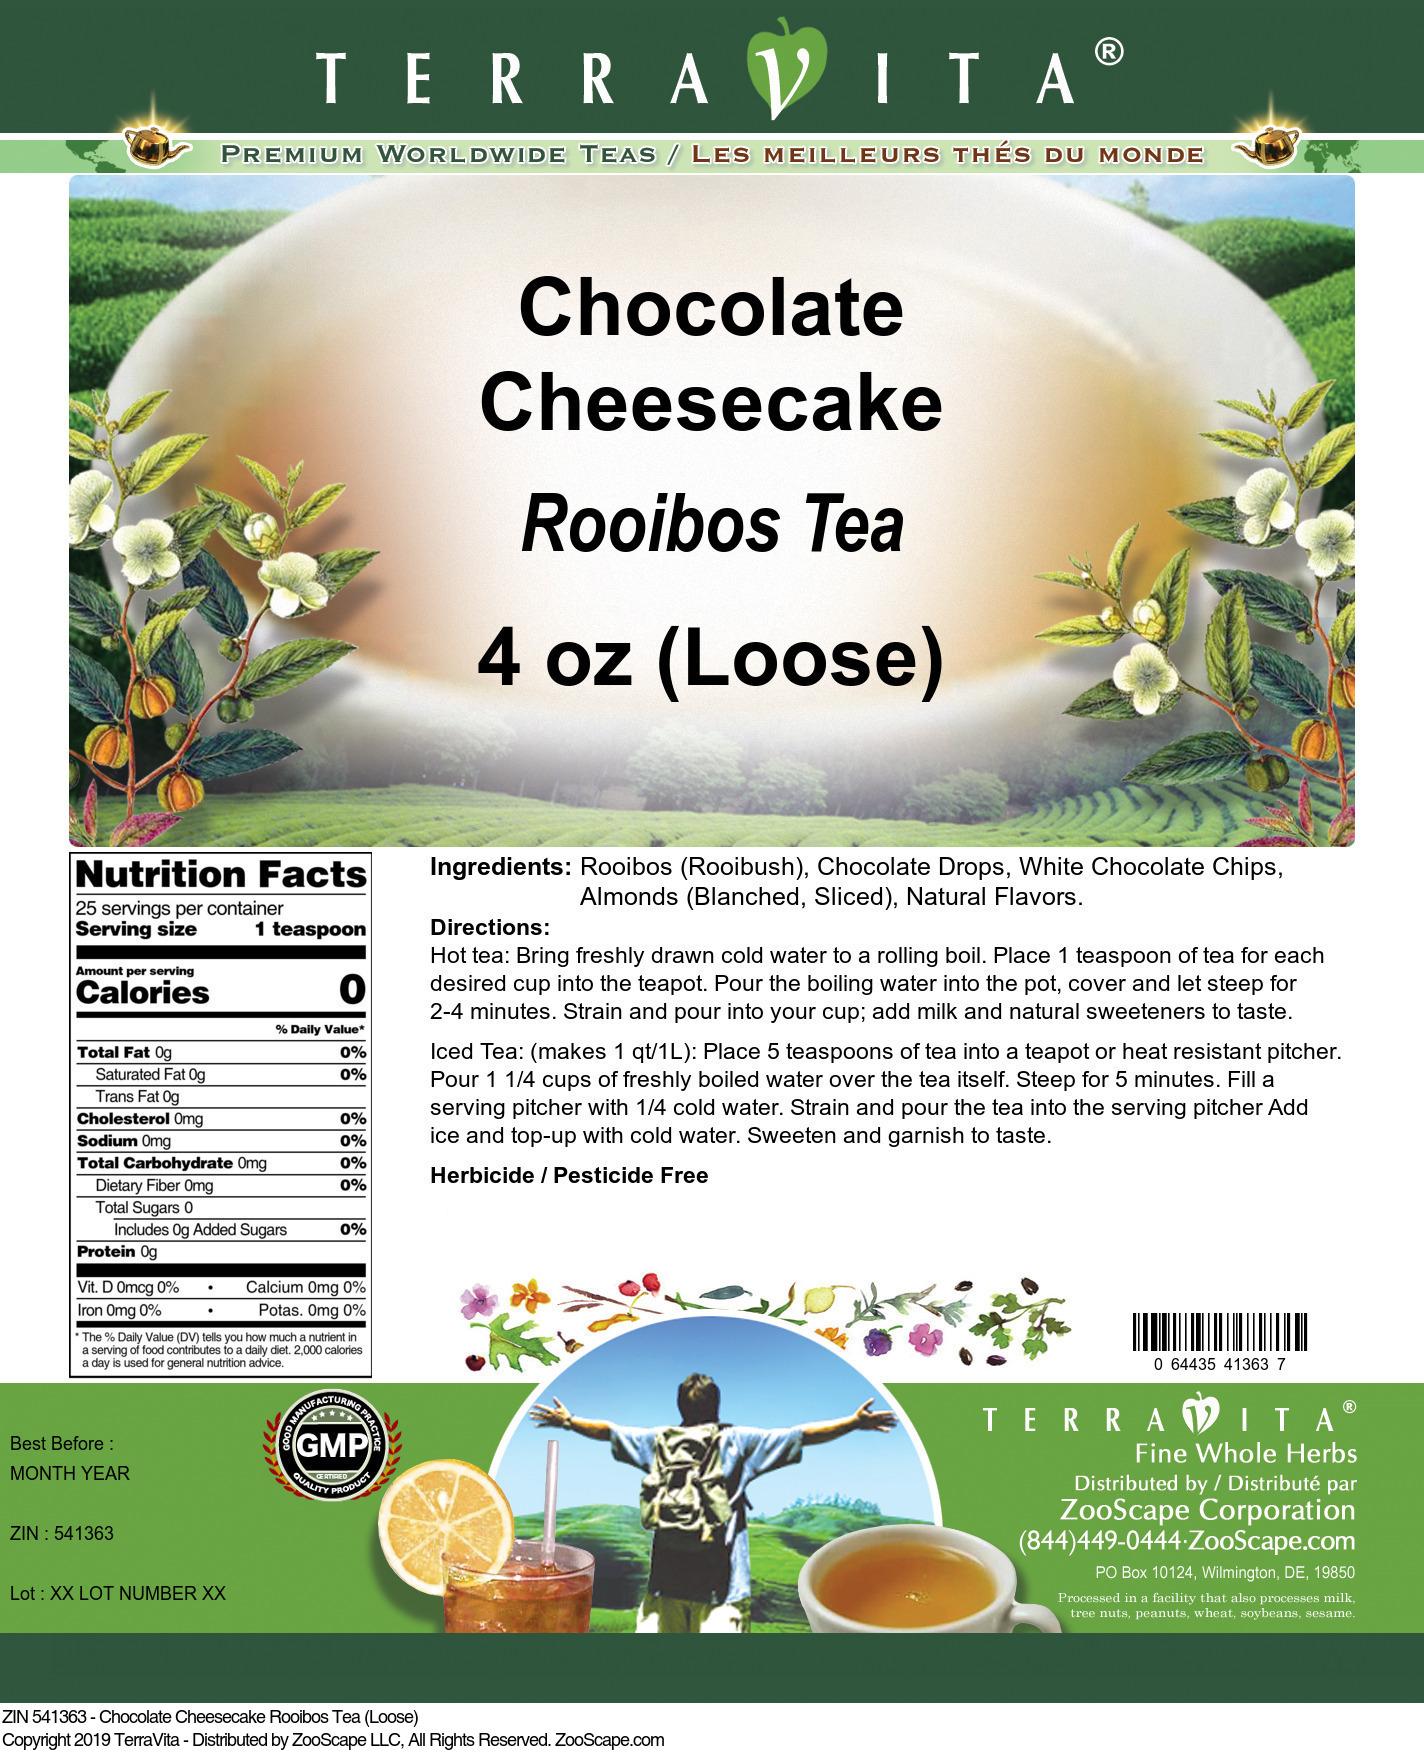 Chocolate Cheesecake Rooibos Tea